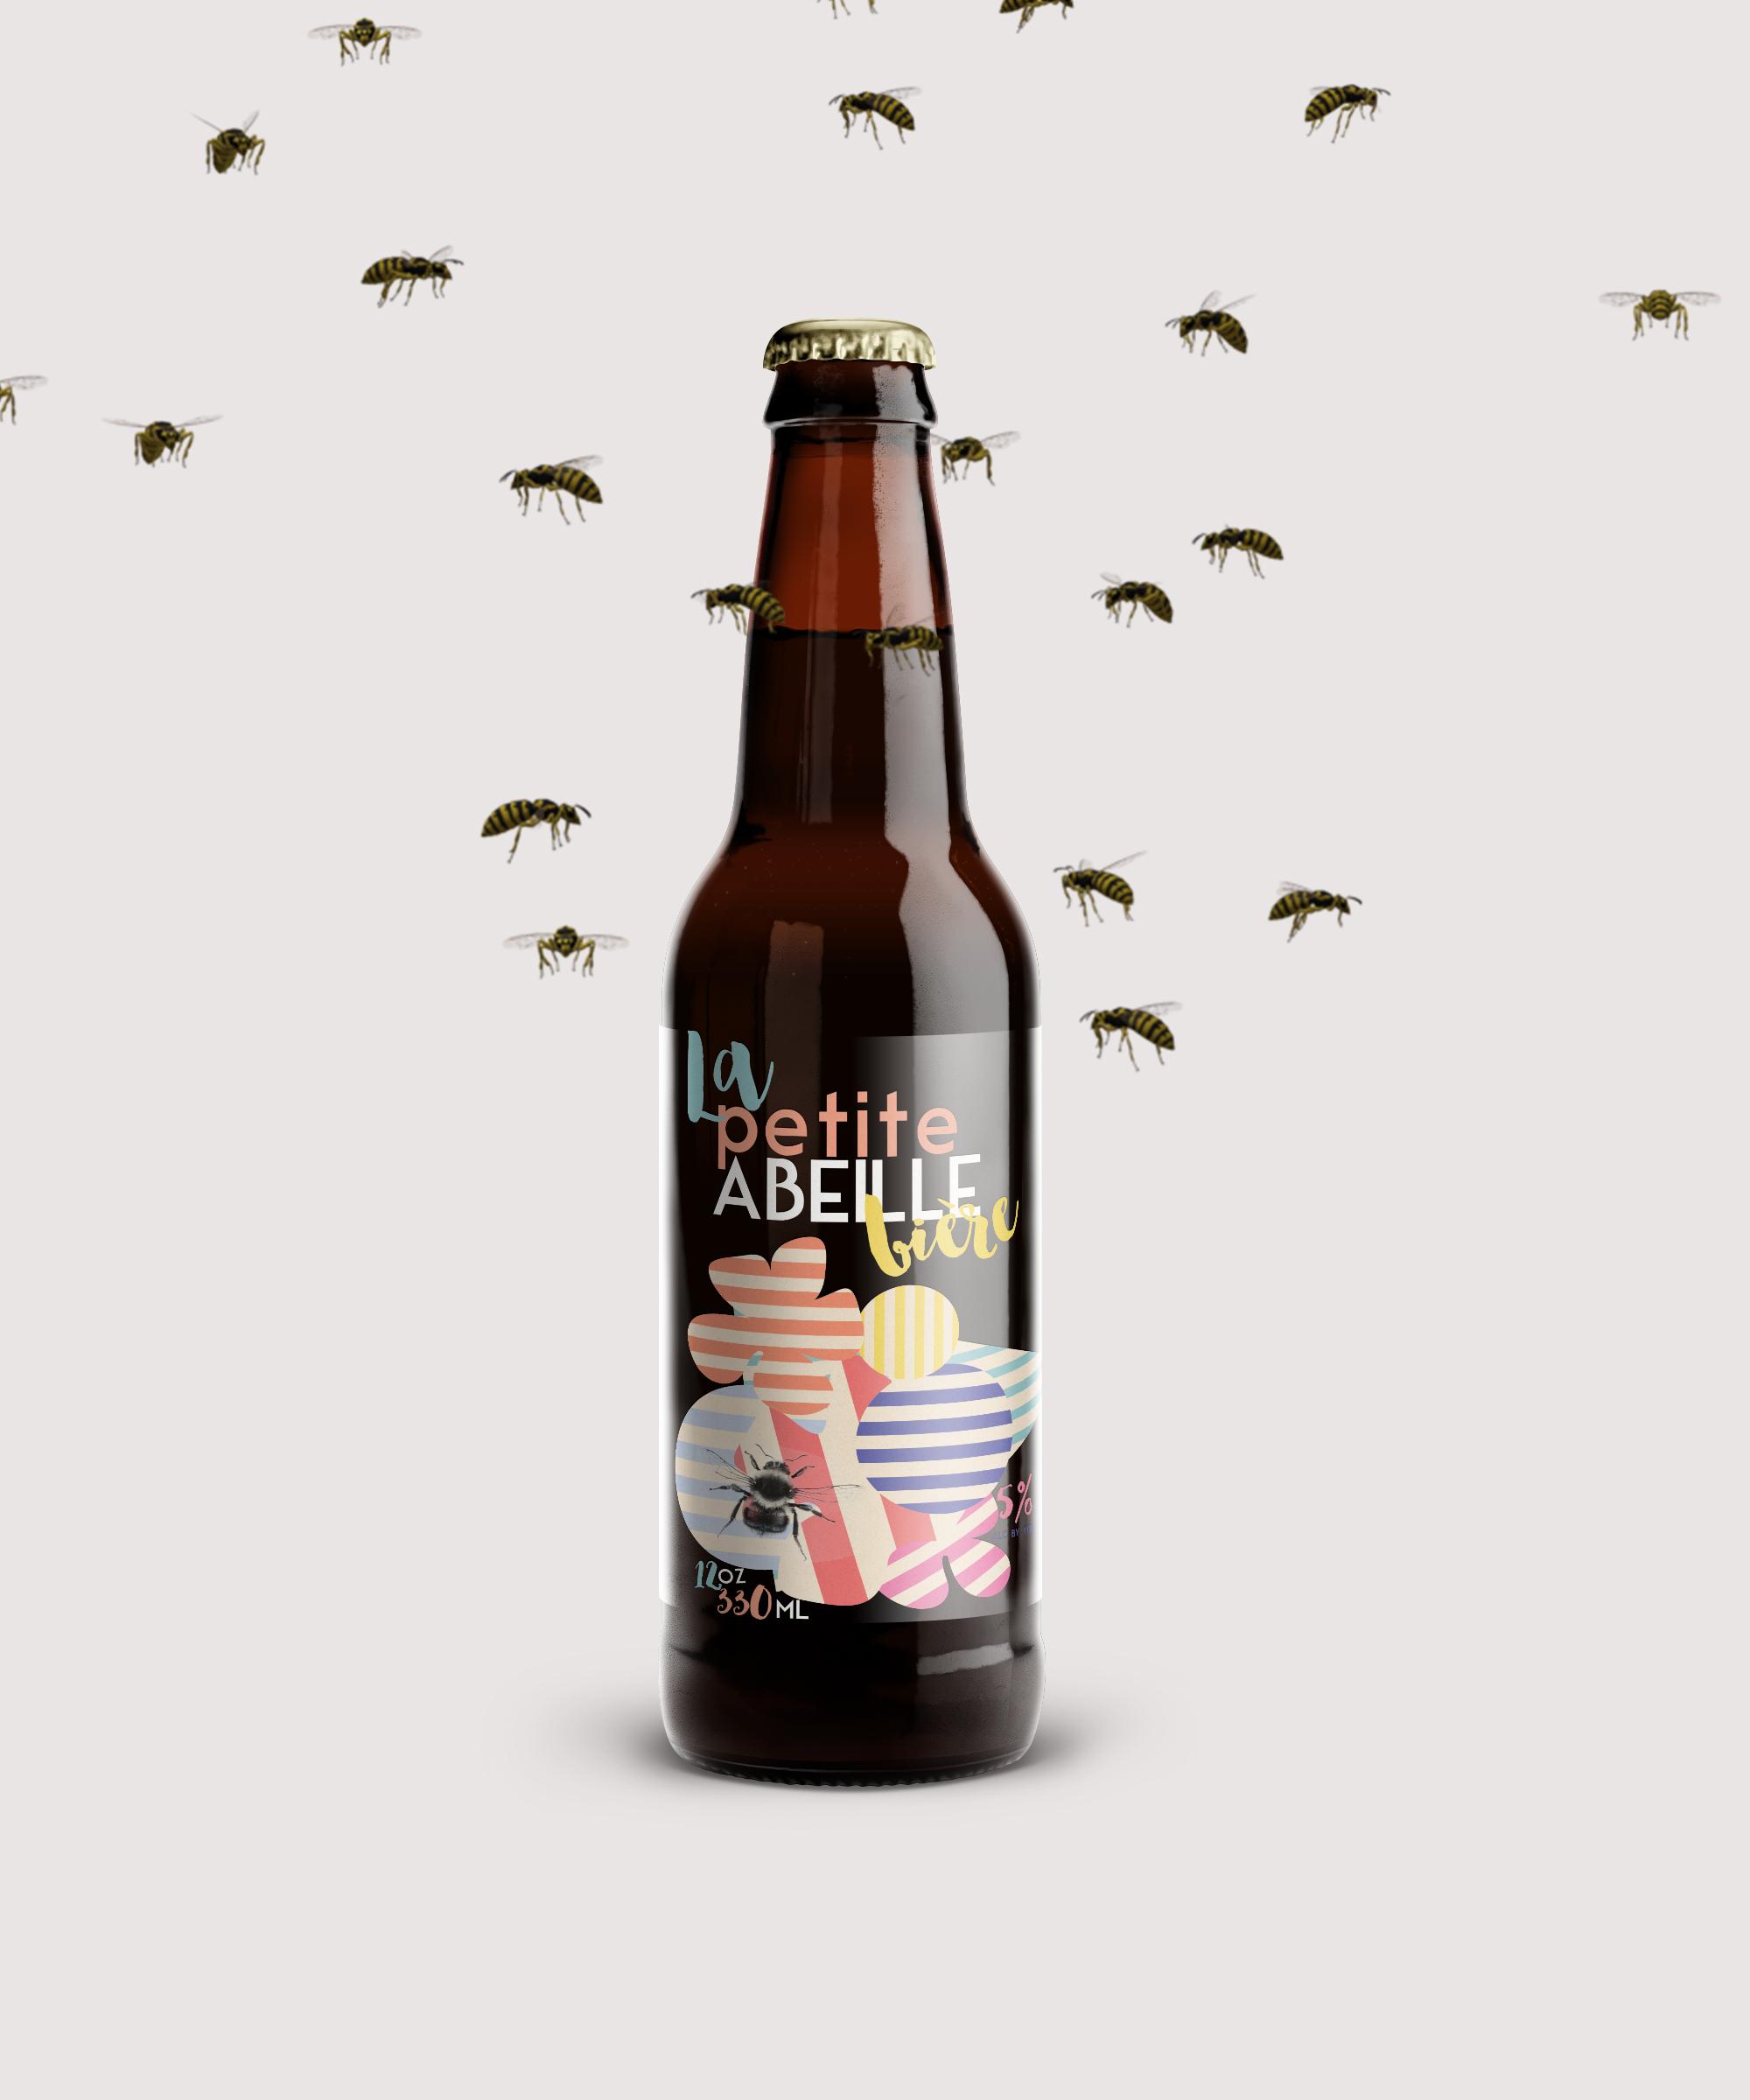 beer-bottle-and-bees.jpg